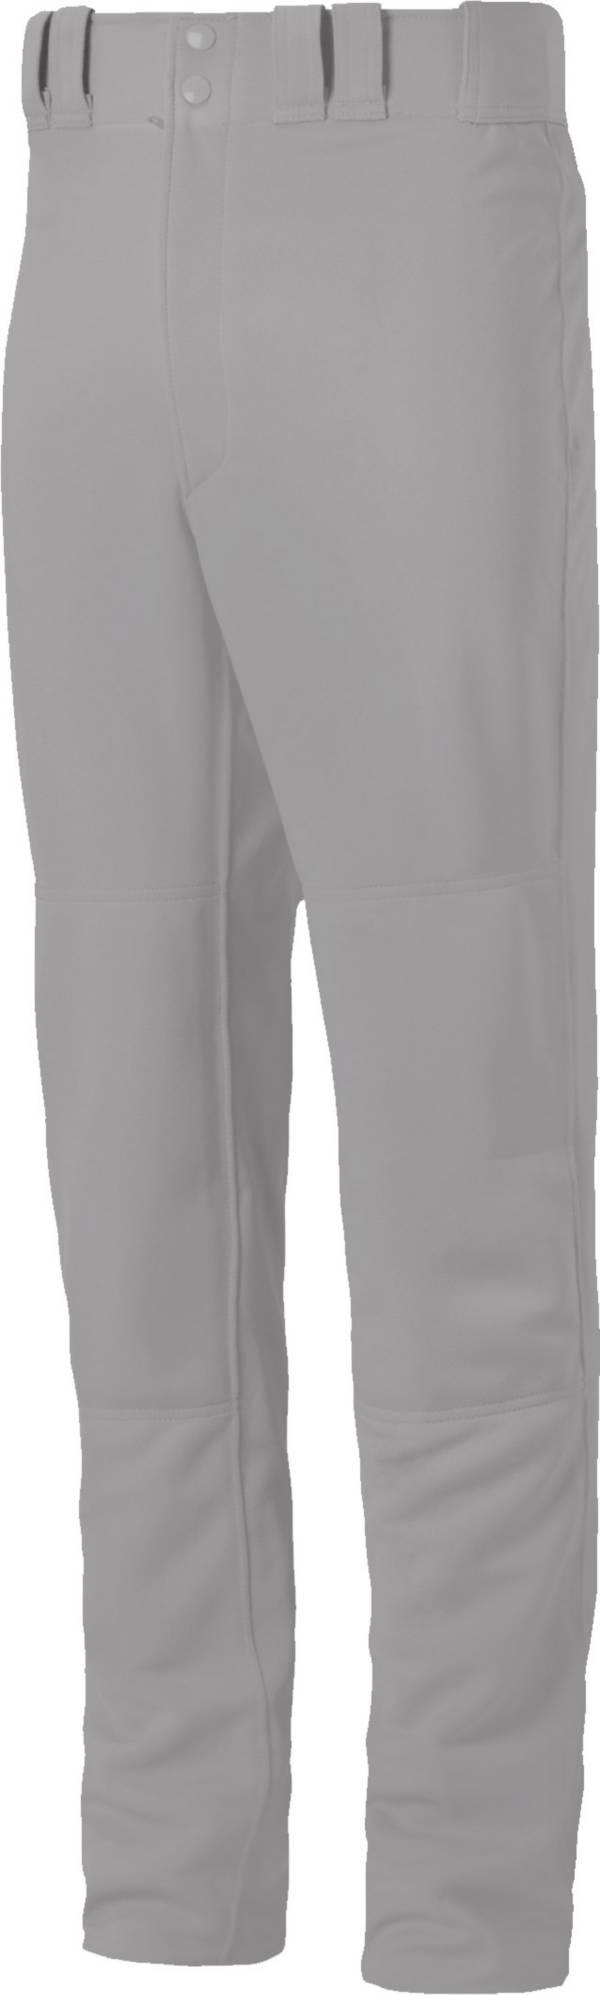 Mizuno Boys' Select Pro G2 Baseball Pants product image